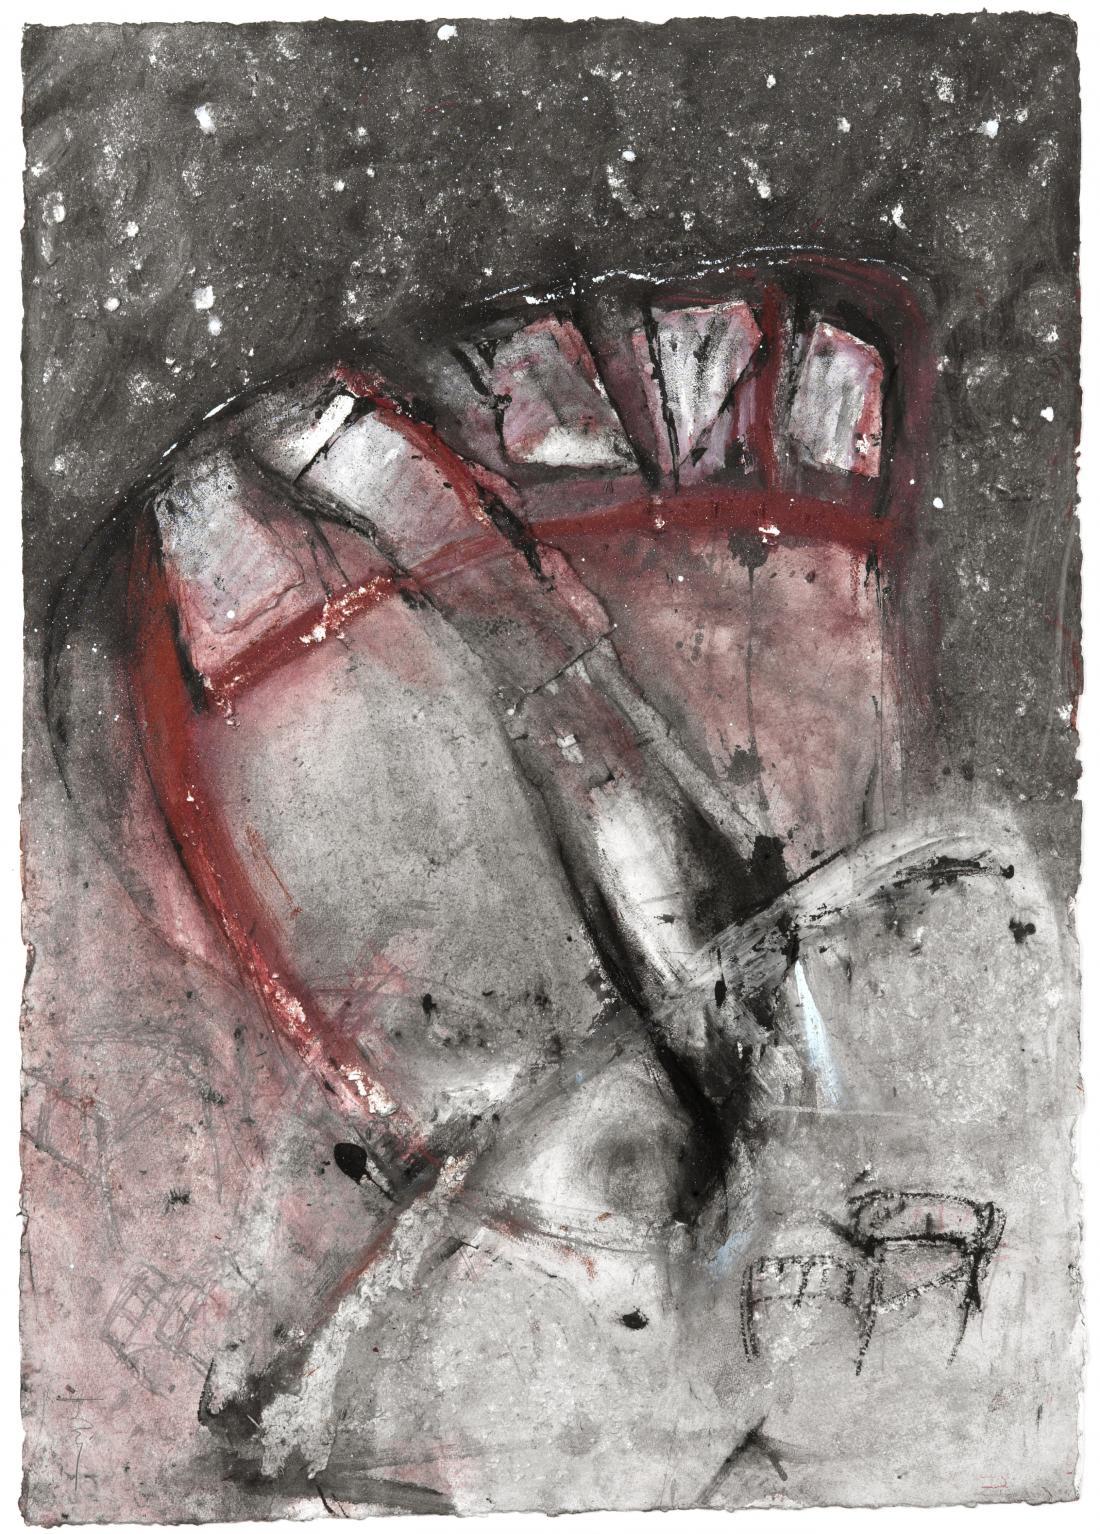 Cama para el espacio II (2001) - Rossana Zaera Clausell